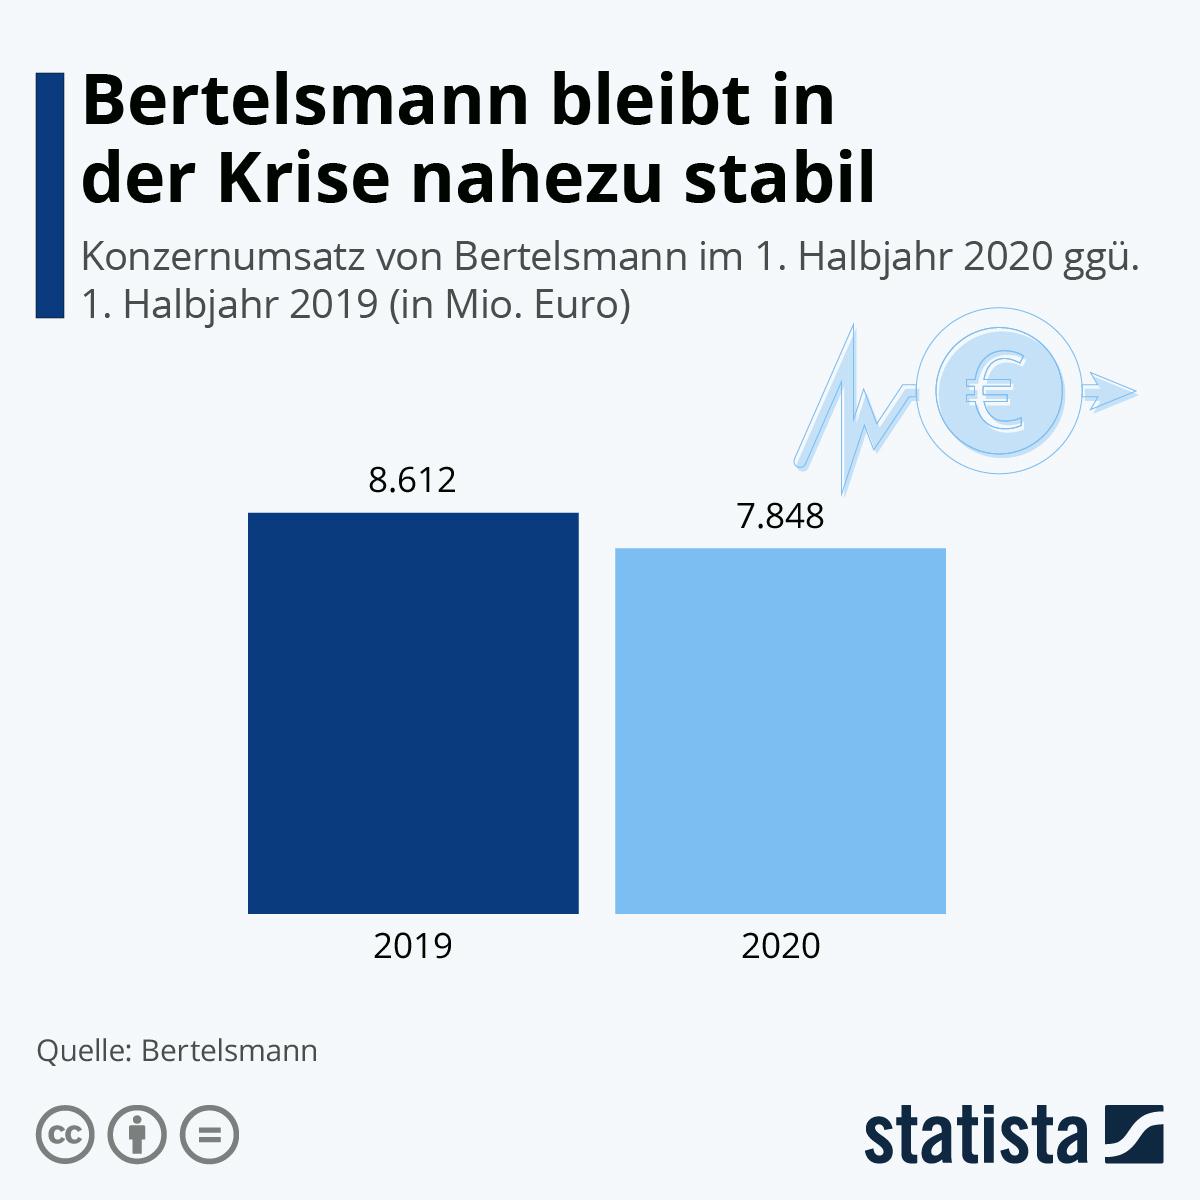 Infografik: Bertelsmann bleibt in der Krise nahezu stabil | Statista